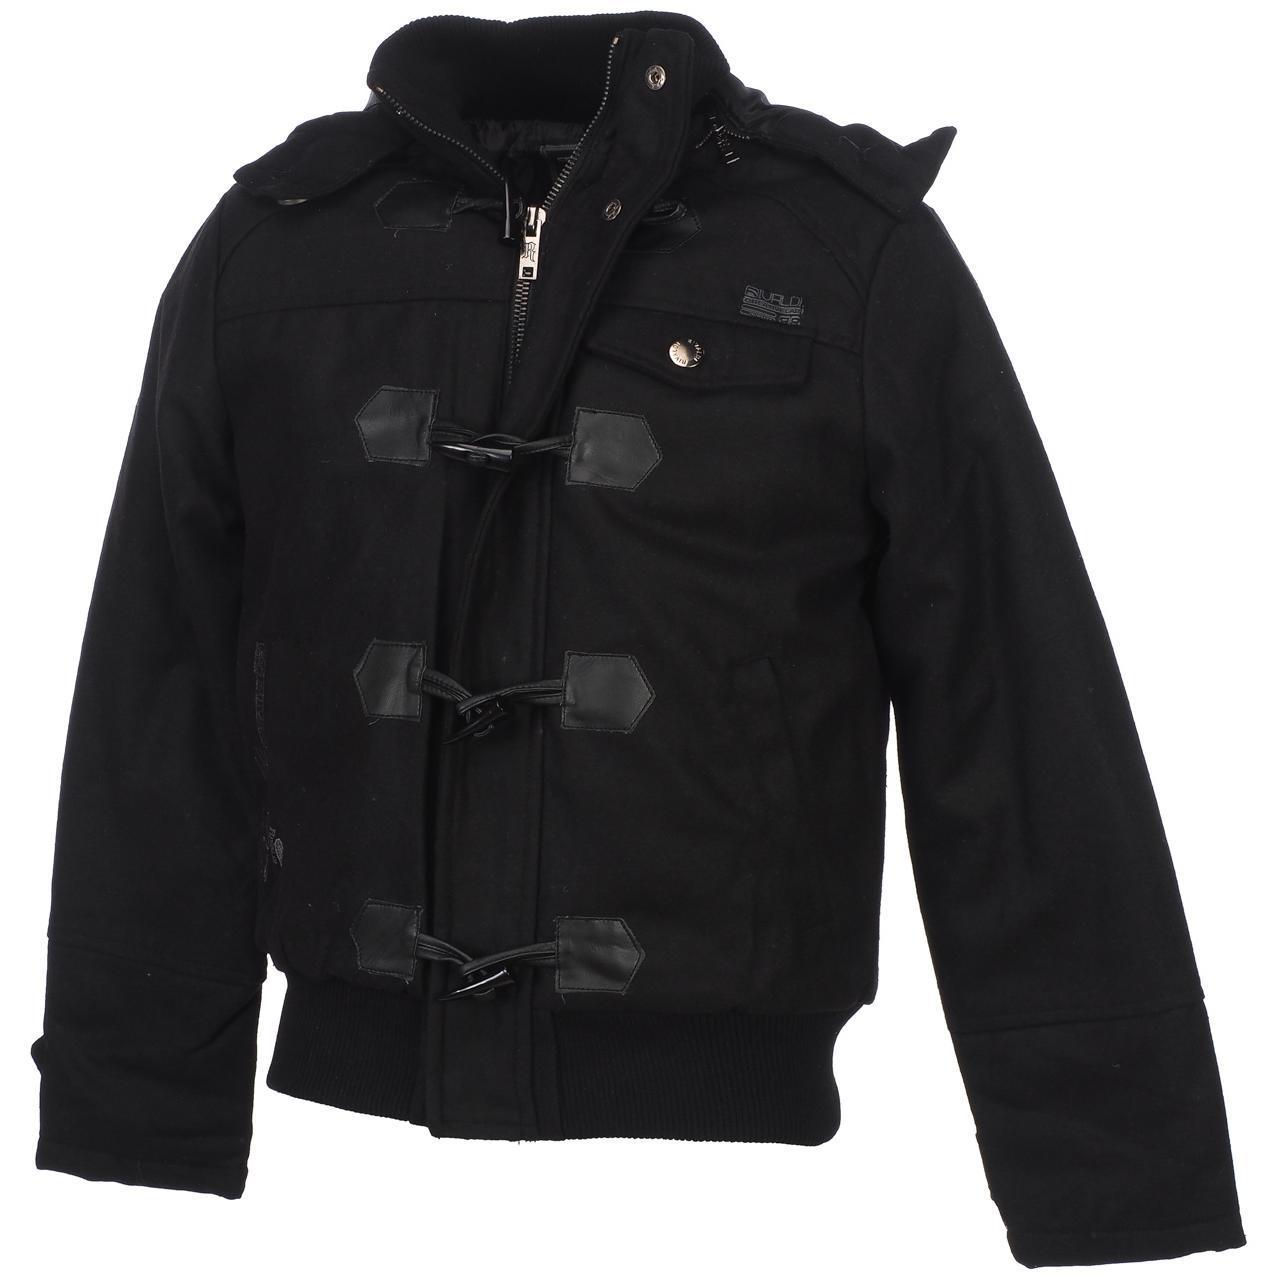 Blouson Reggio black doudoune Noir 52645